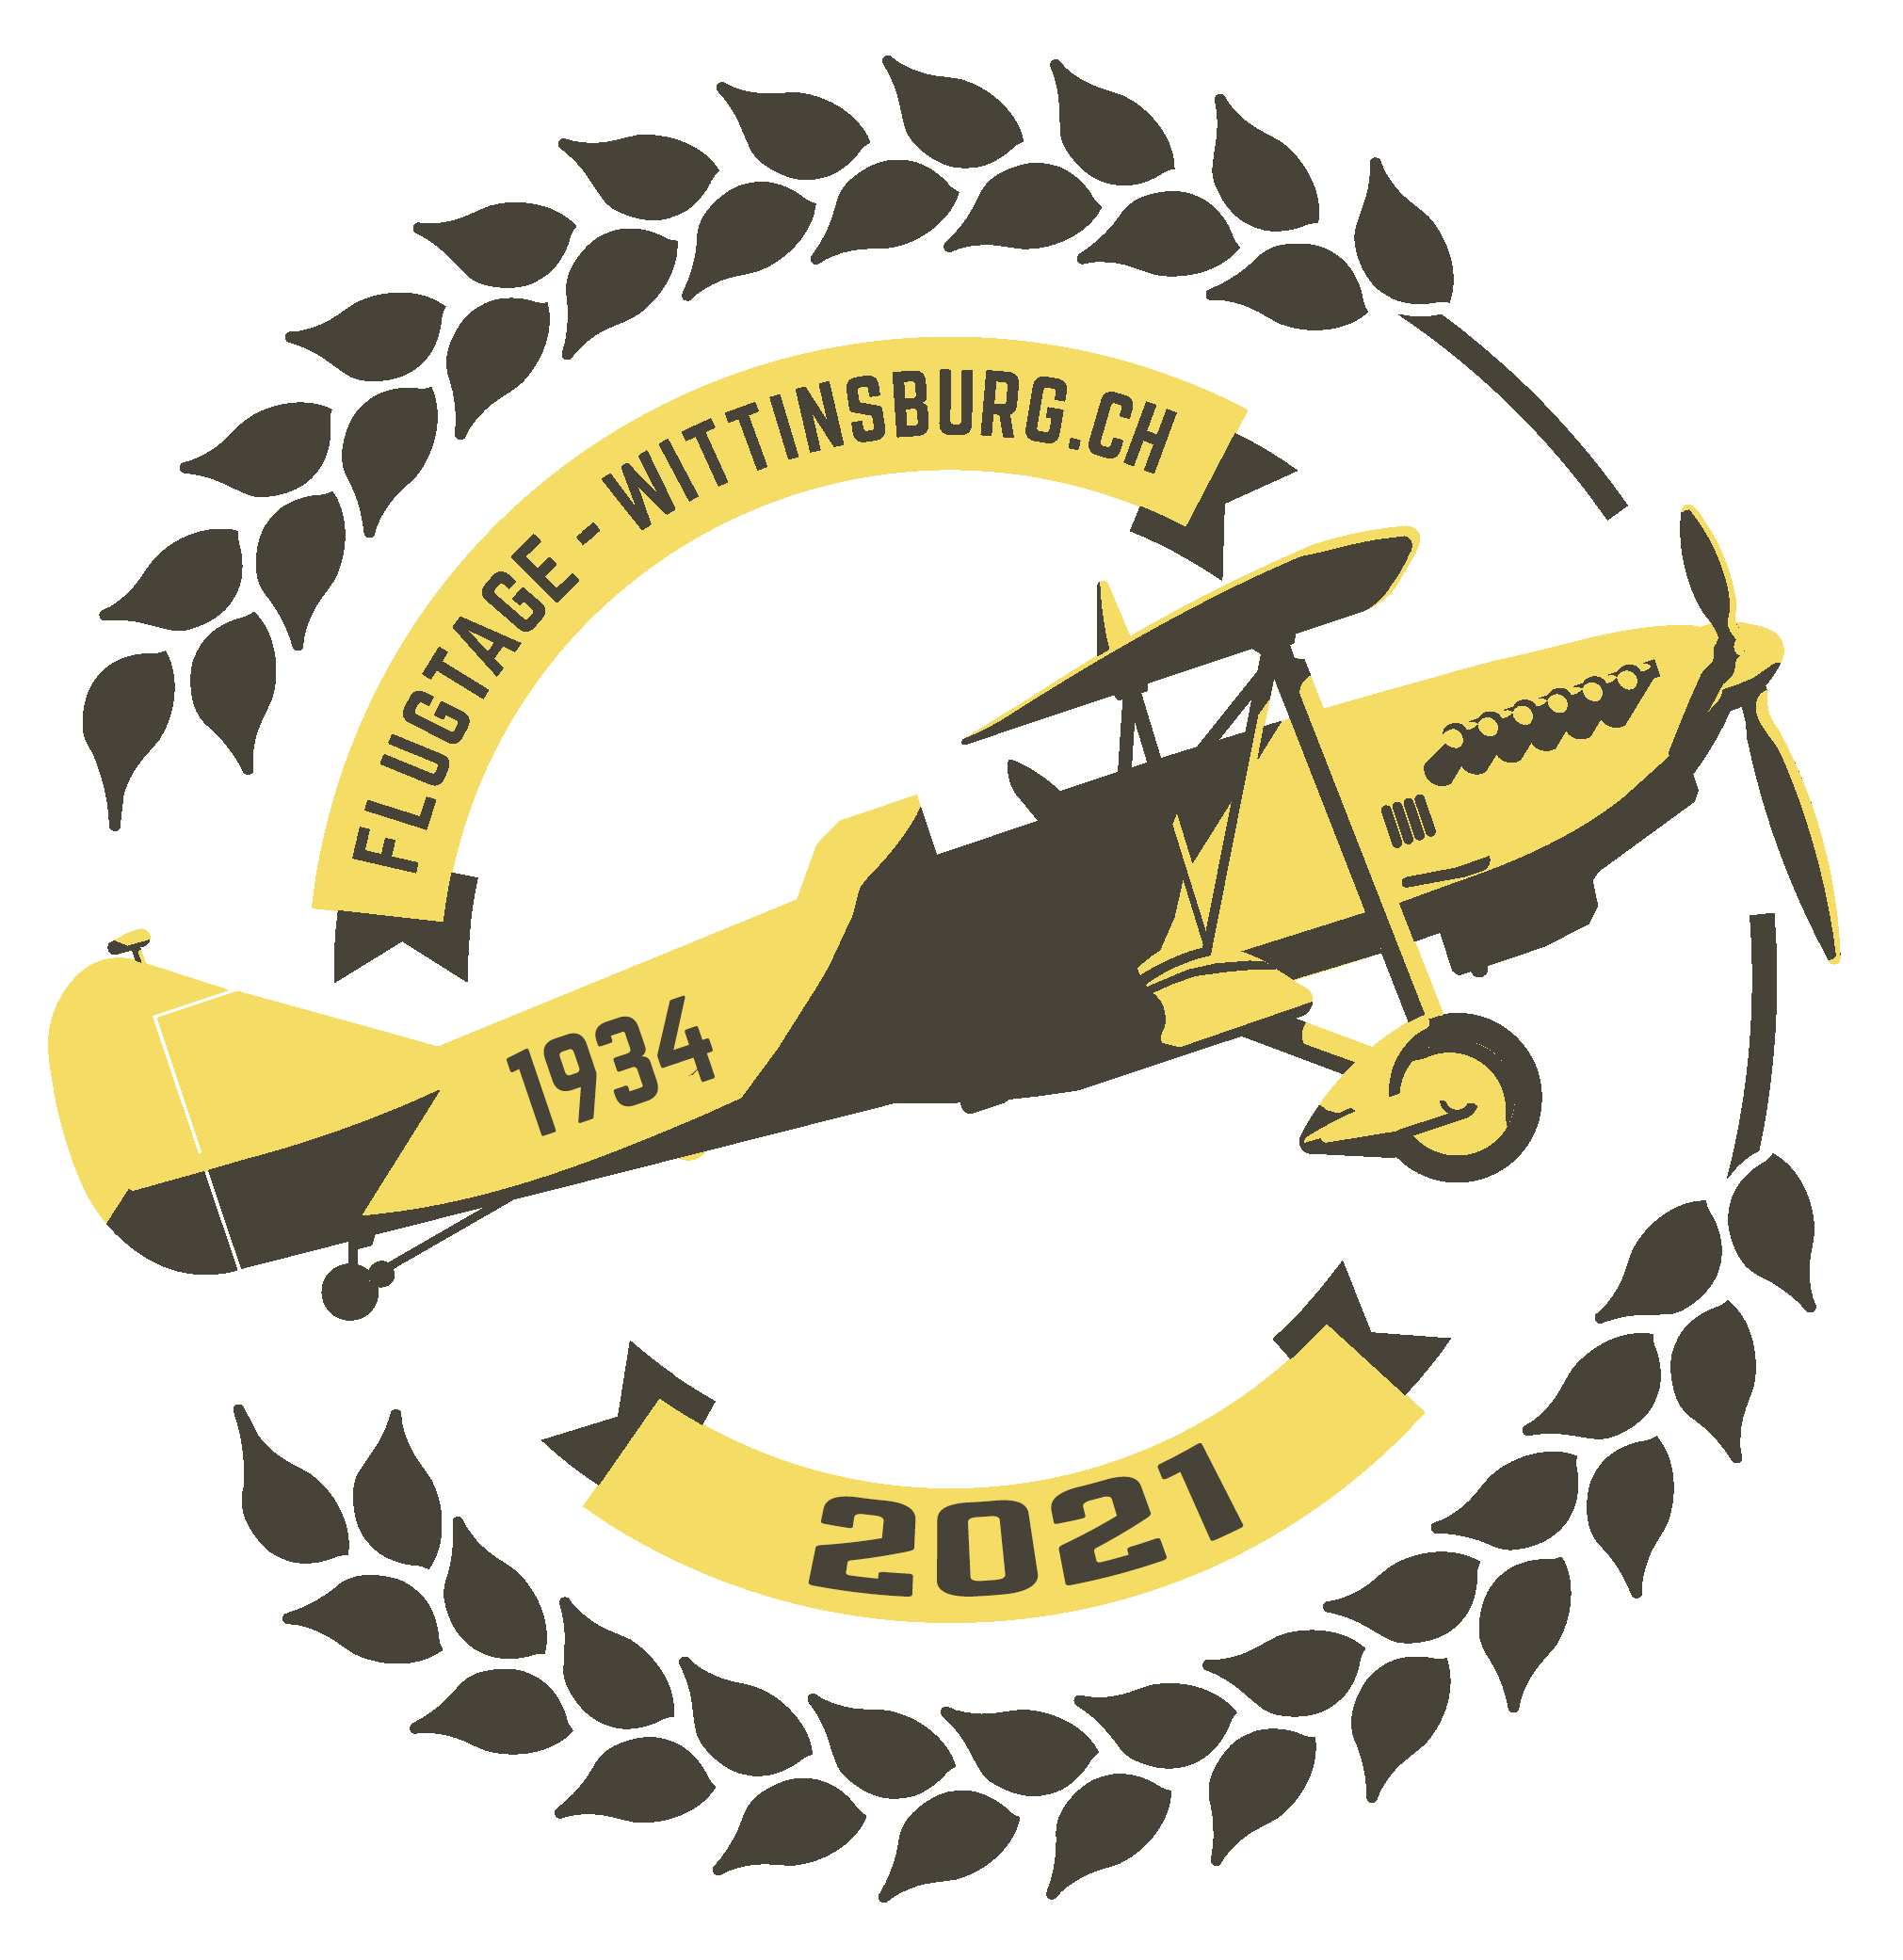 FLUGTAGE WITTINSBURG